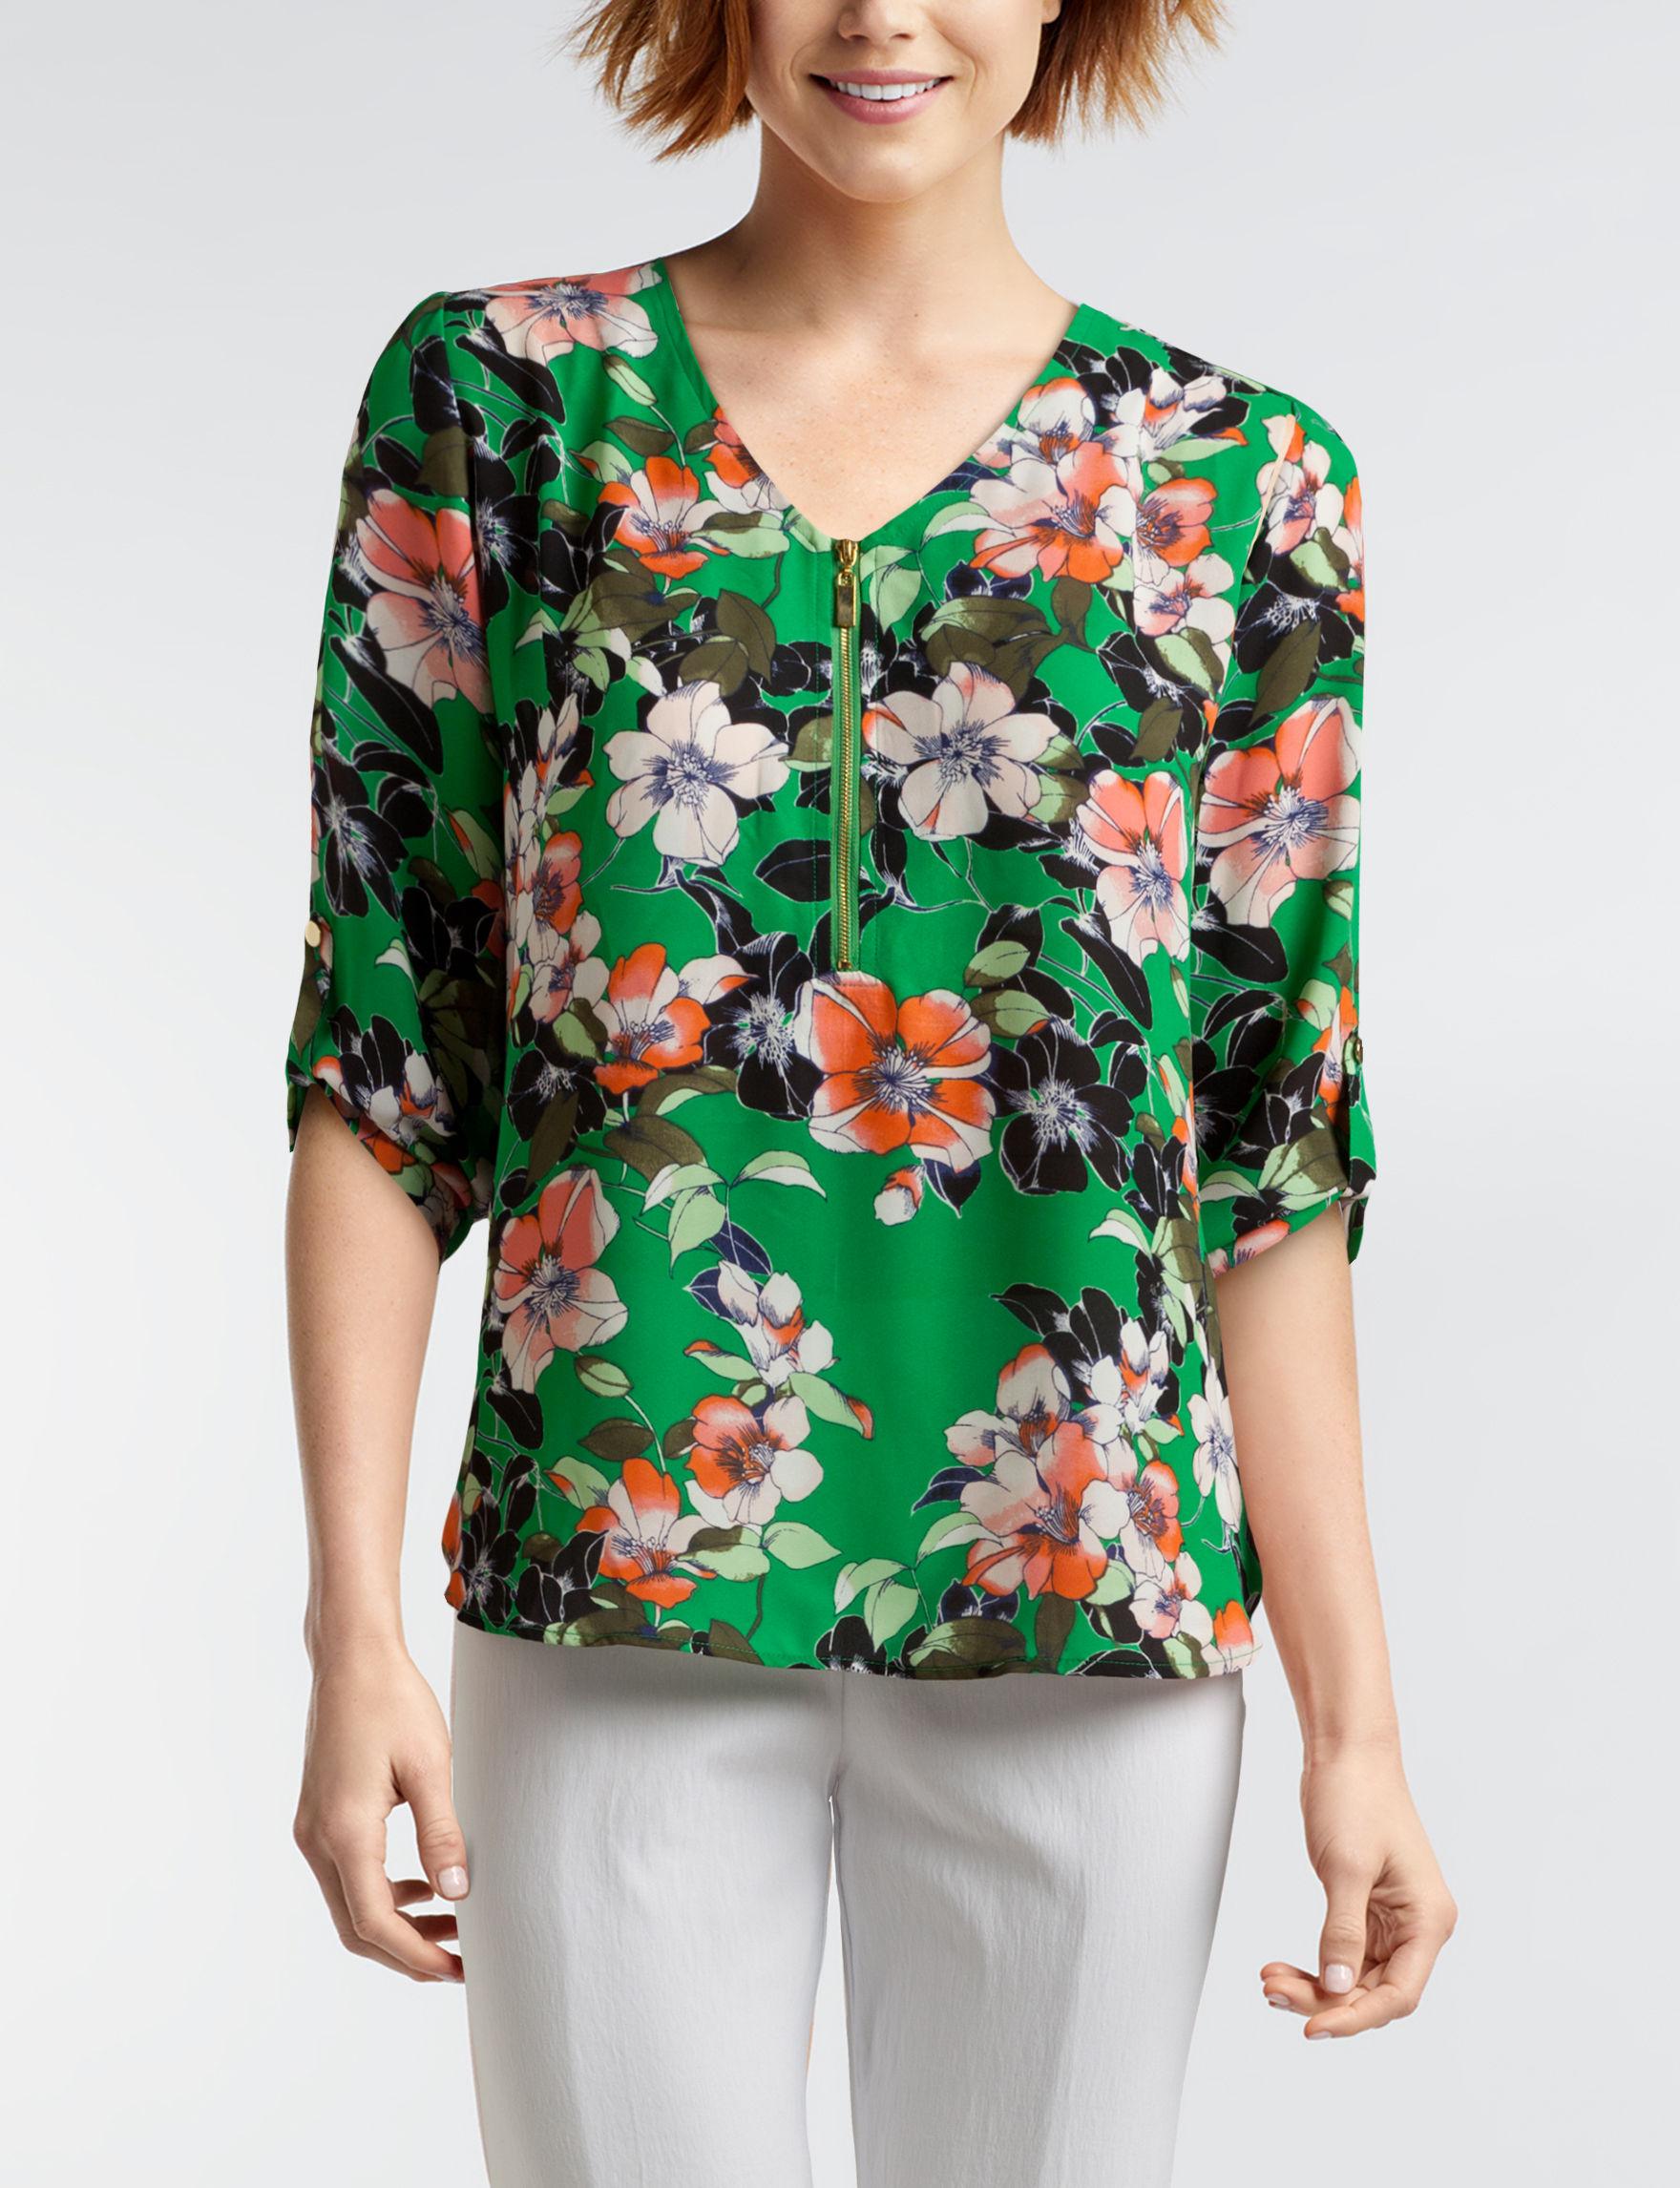 Valerie Stevens Green Floral Shirts & Blouses